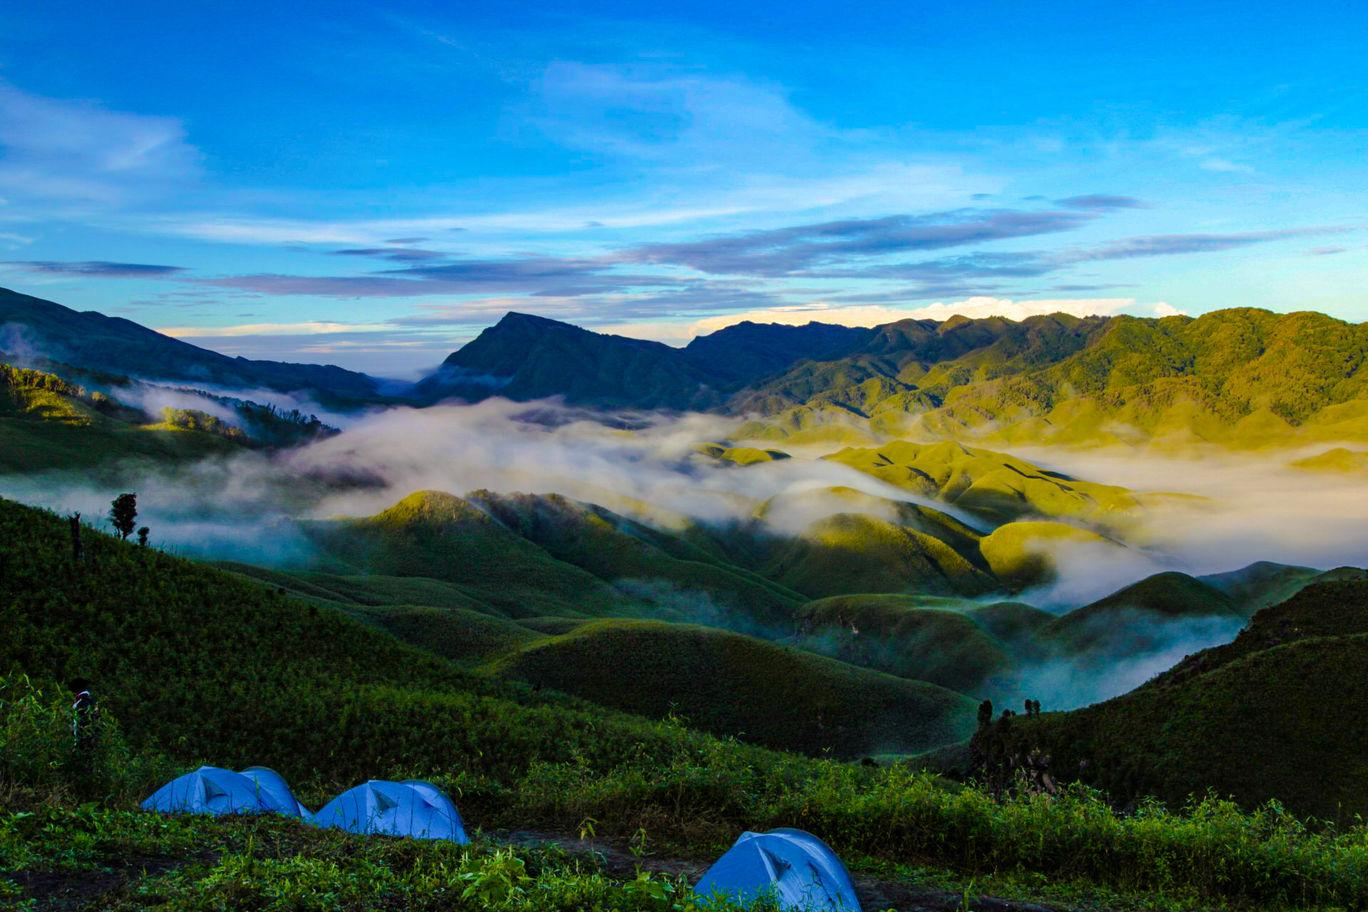 Photo of Dzükou Valley By Dimpy Gogoi